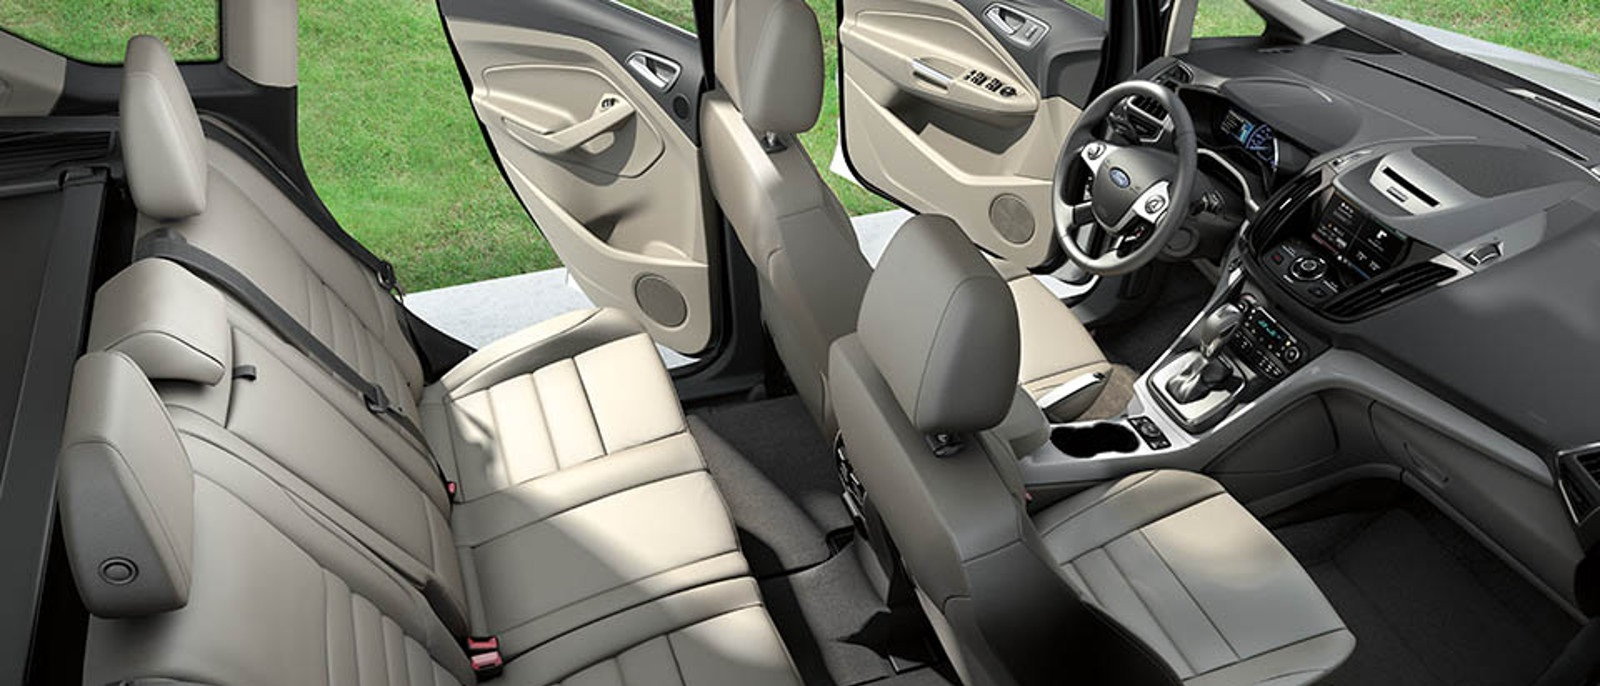 2015 Ford C-MAX Energi Hybrid Interior